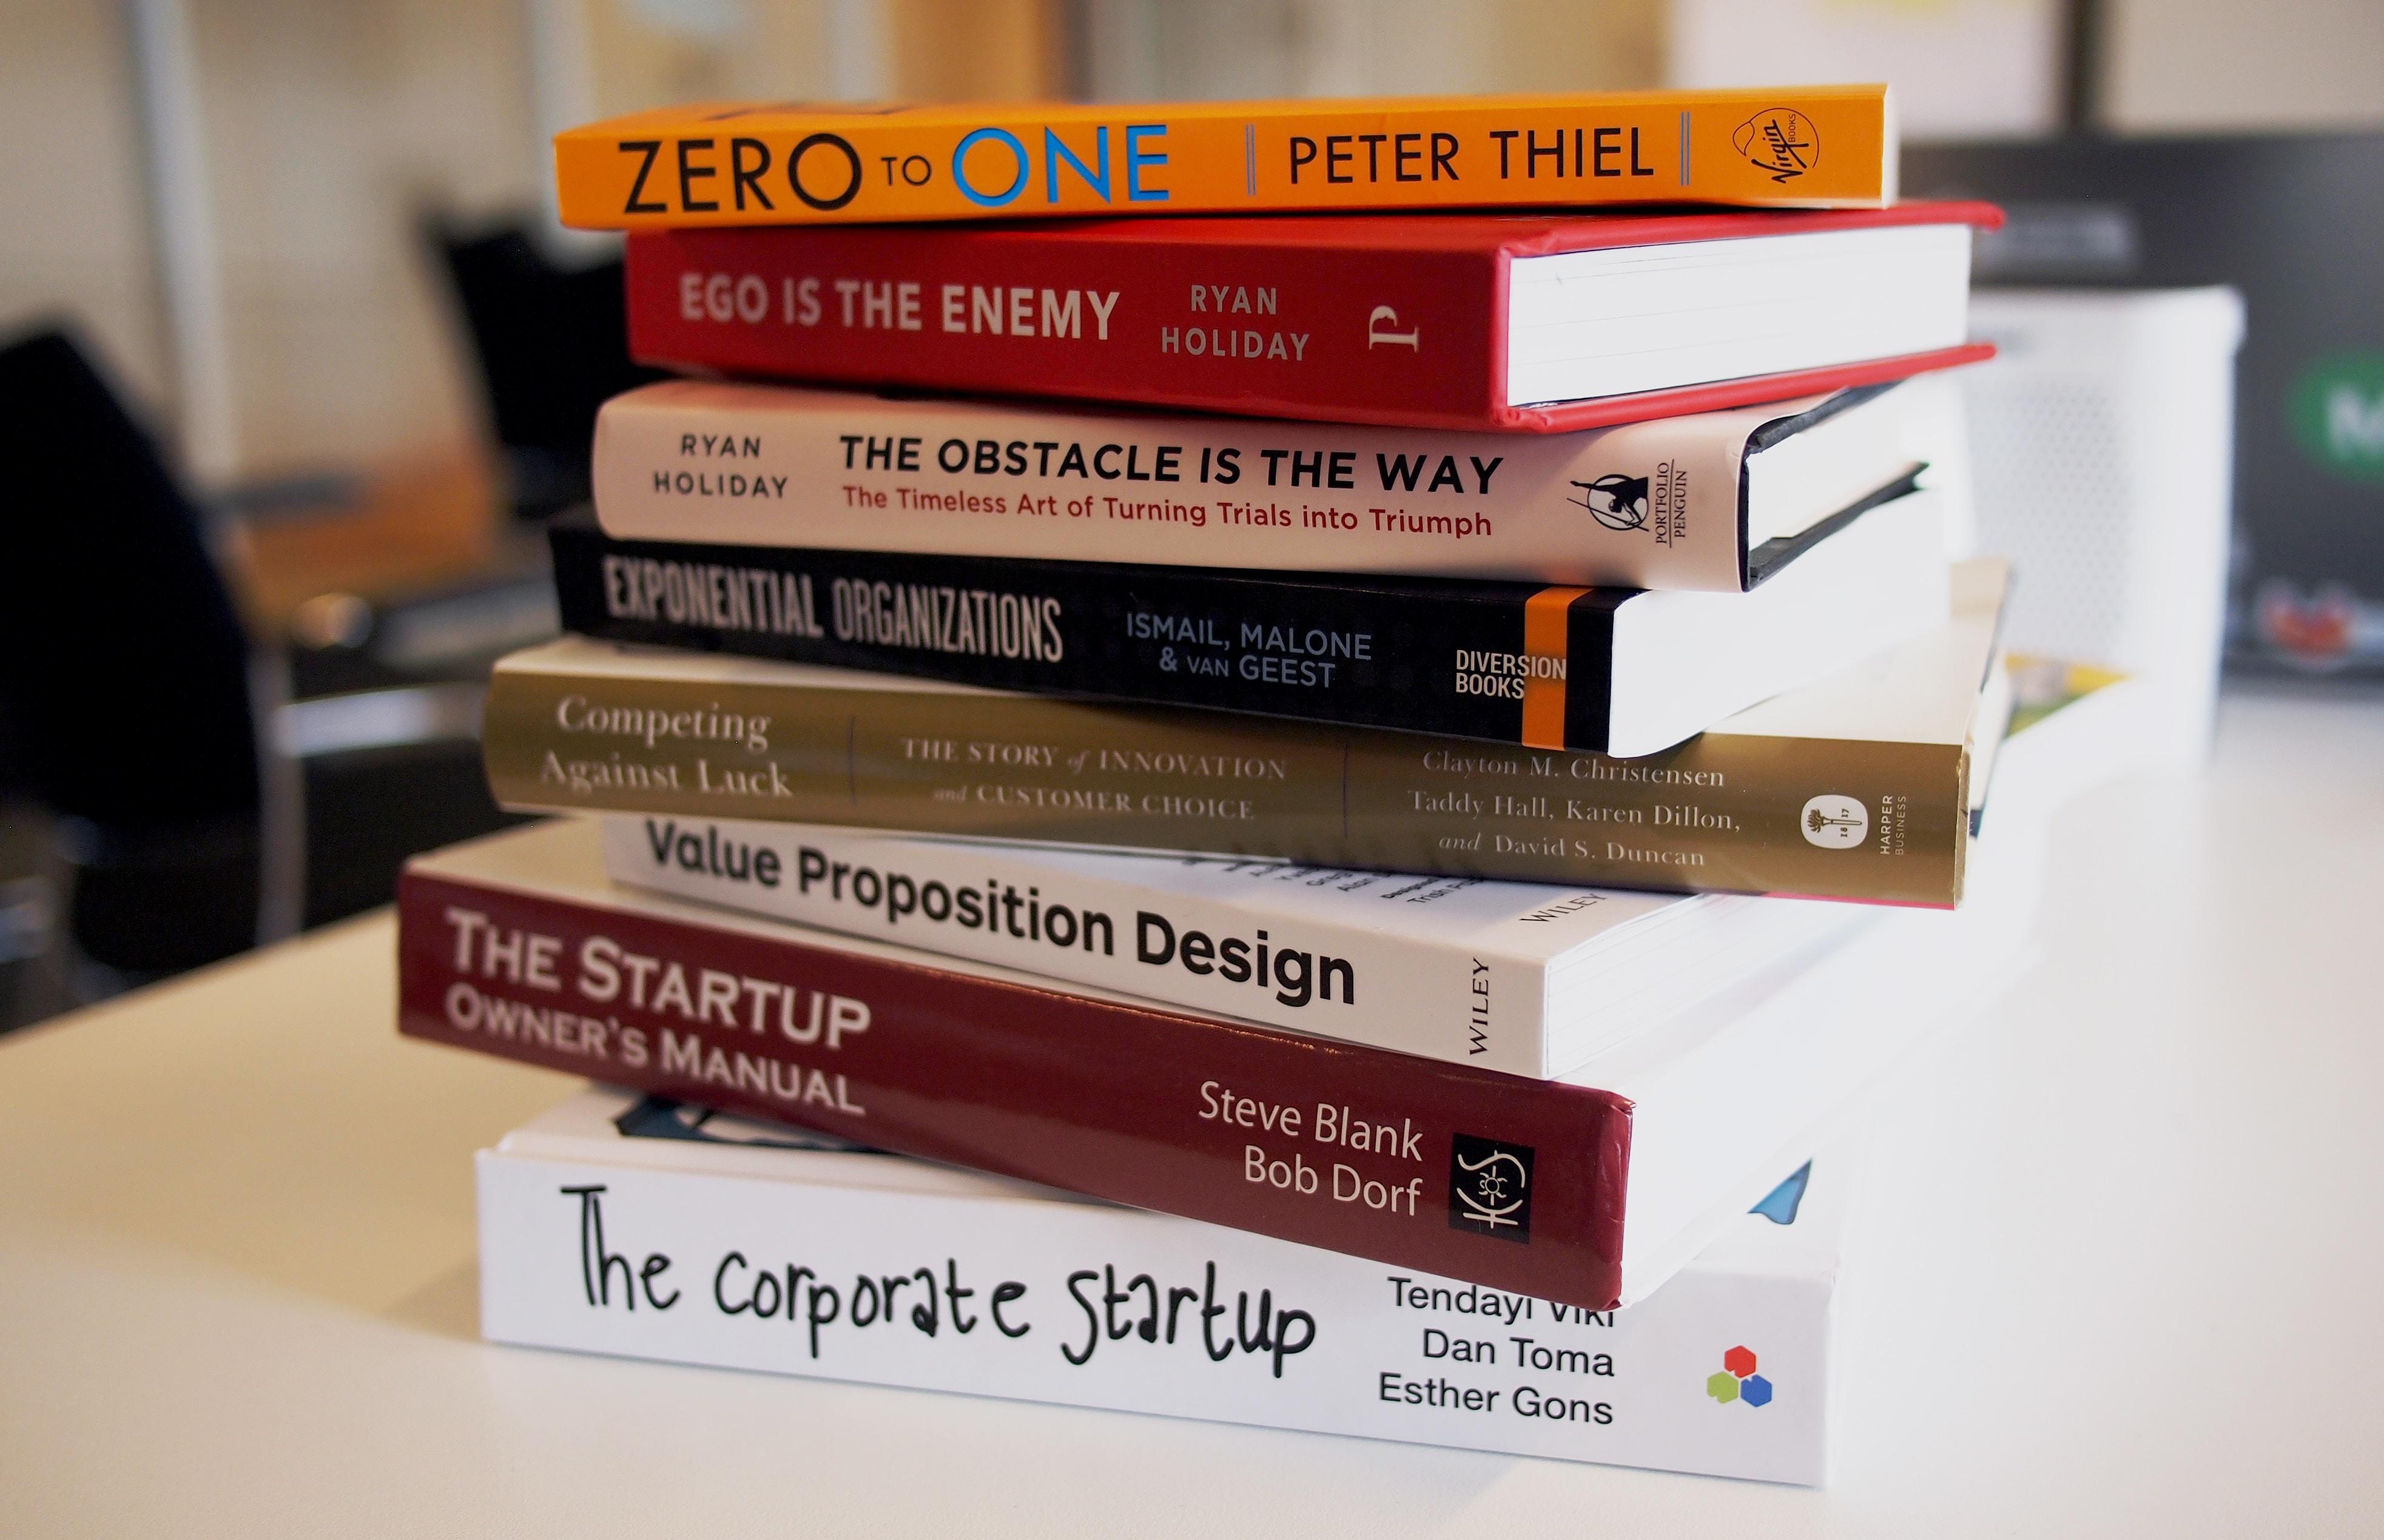 Startup program information